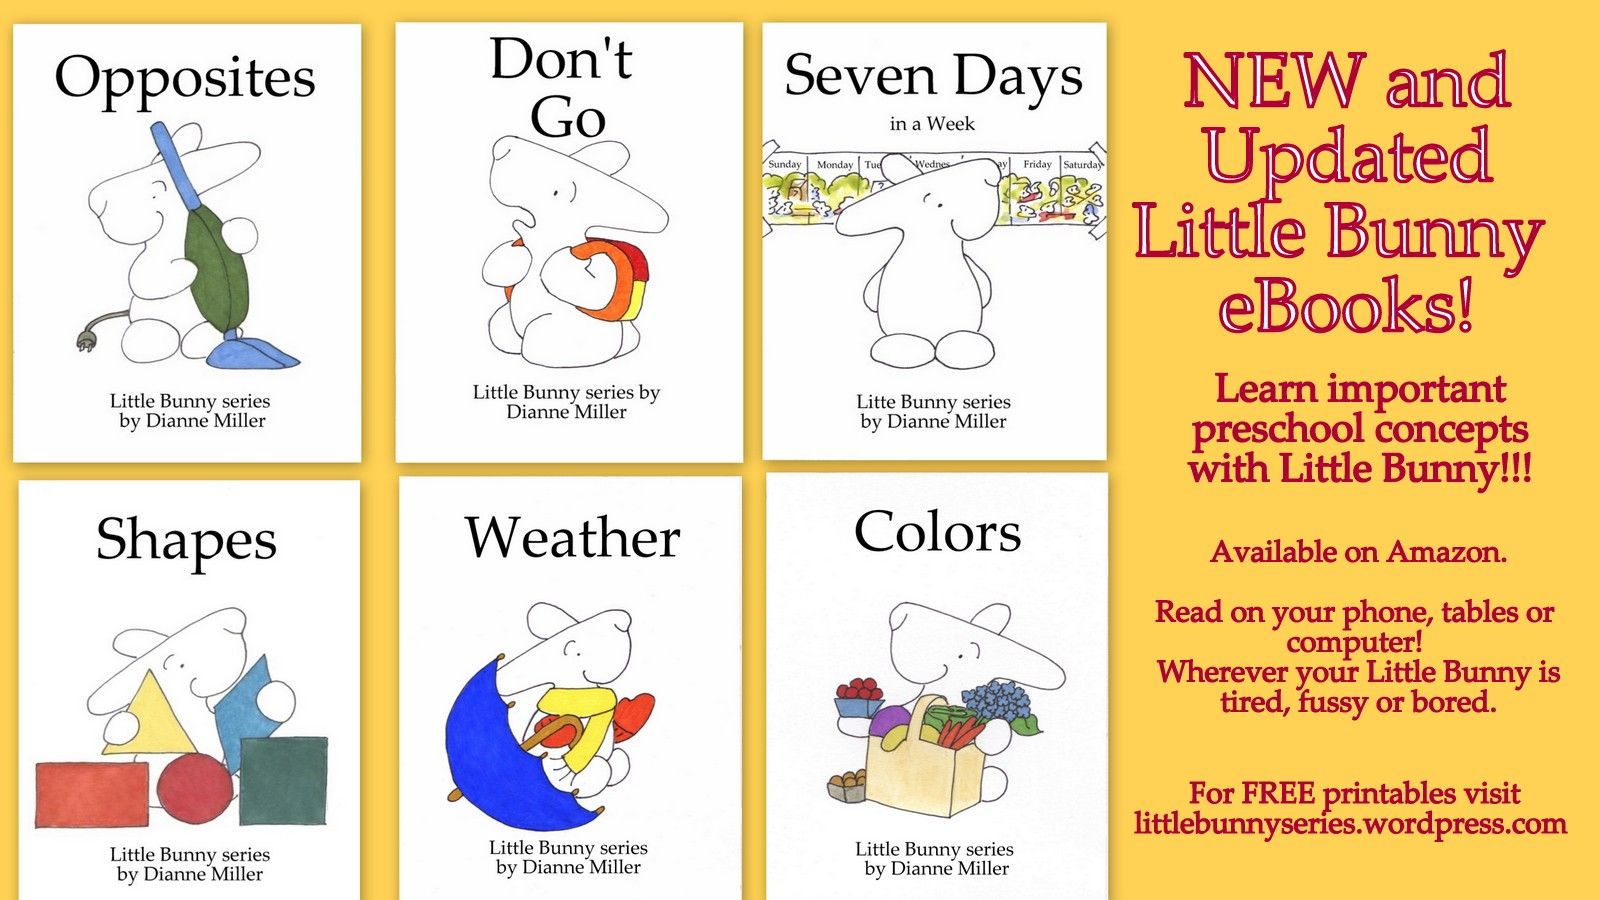 Learn Preschool Concepts Read Little Bunny Ebooks On All